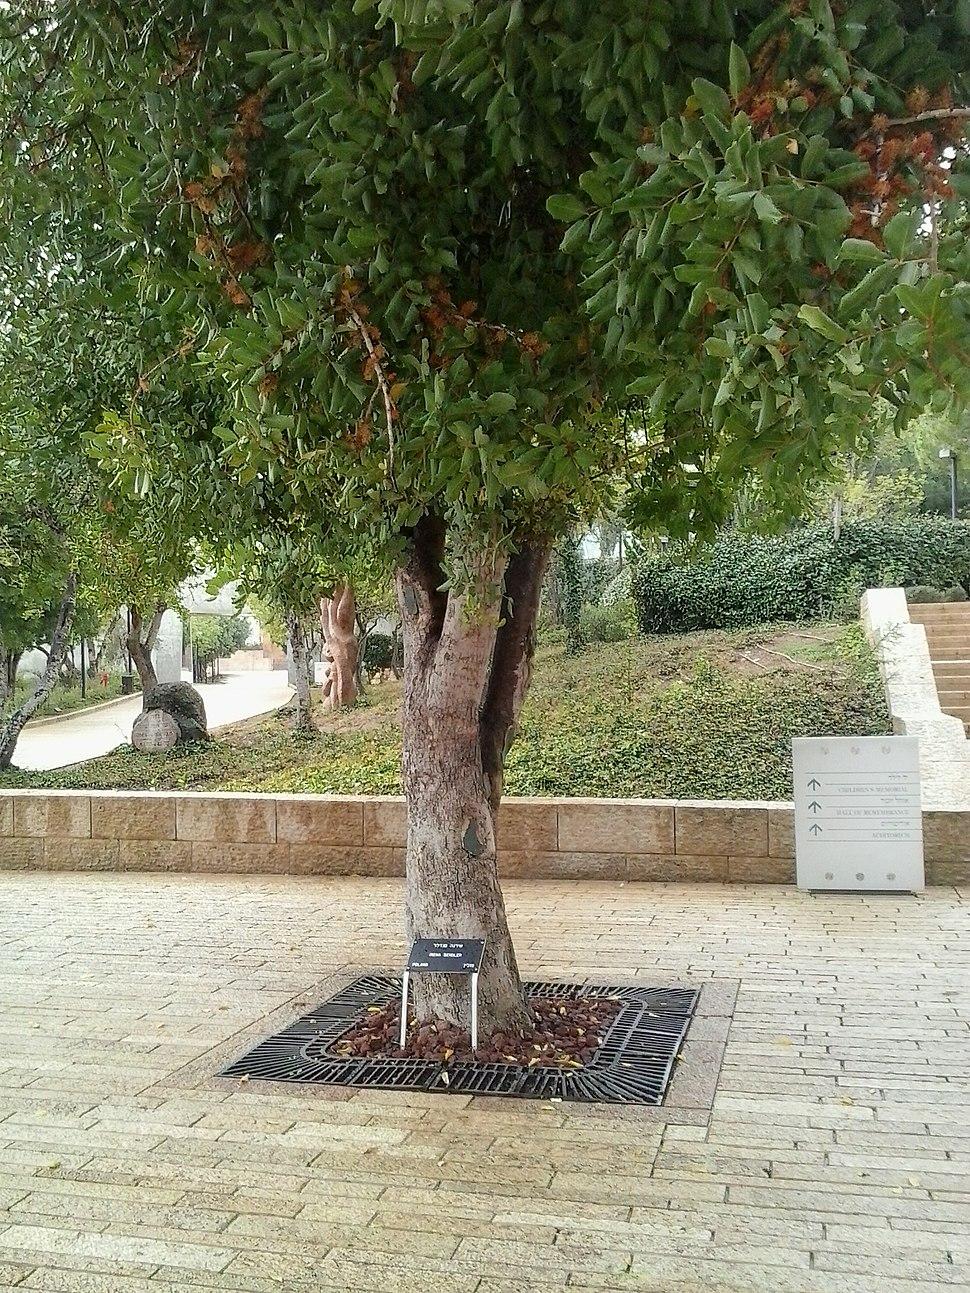 Irena sendler tree